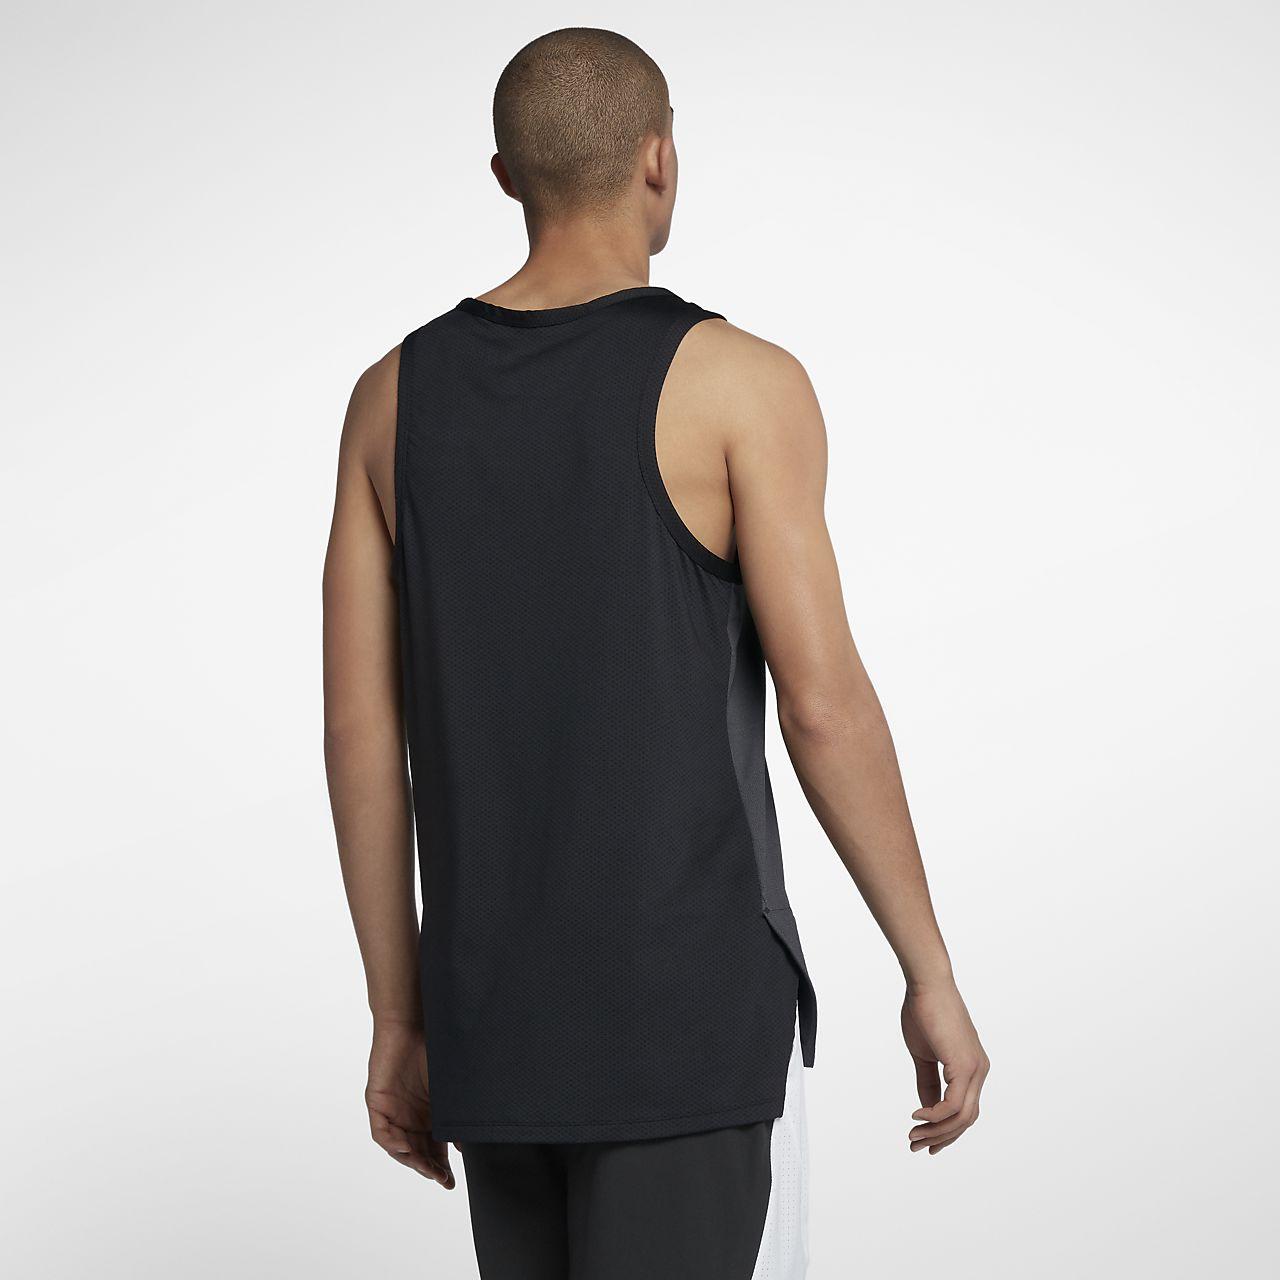 0d72e6f27174bd Nike Dry Hyper Elite Men s Sleeveless Basketball Top. Nike.com LU